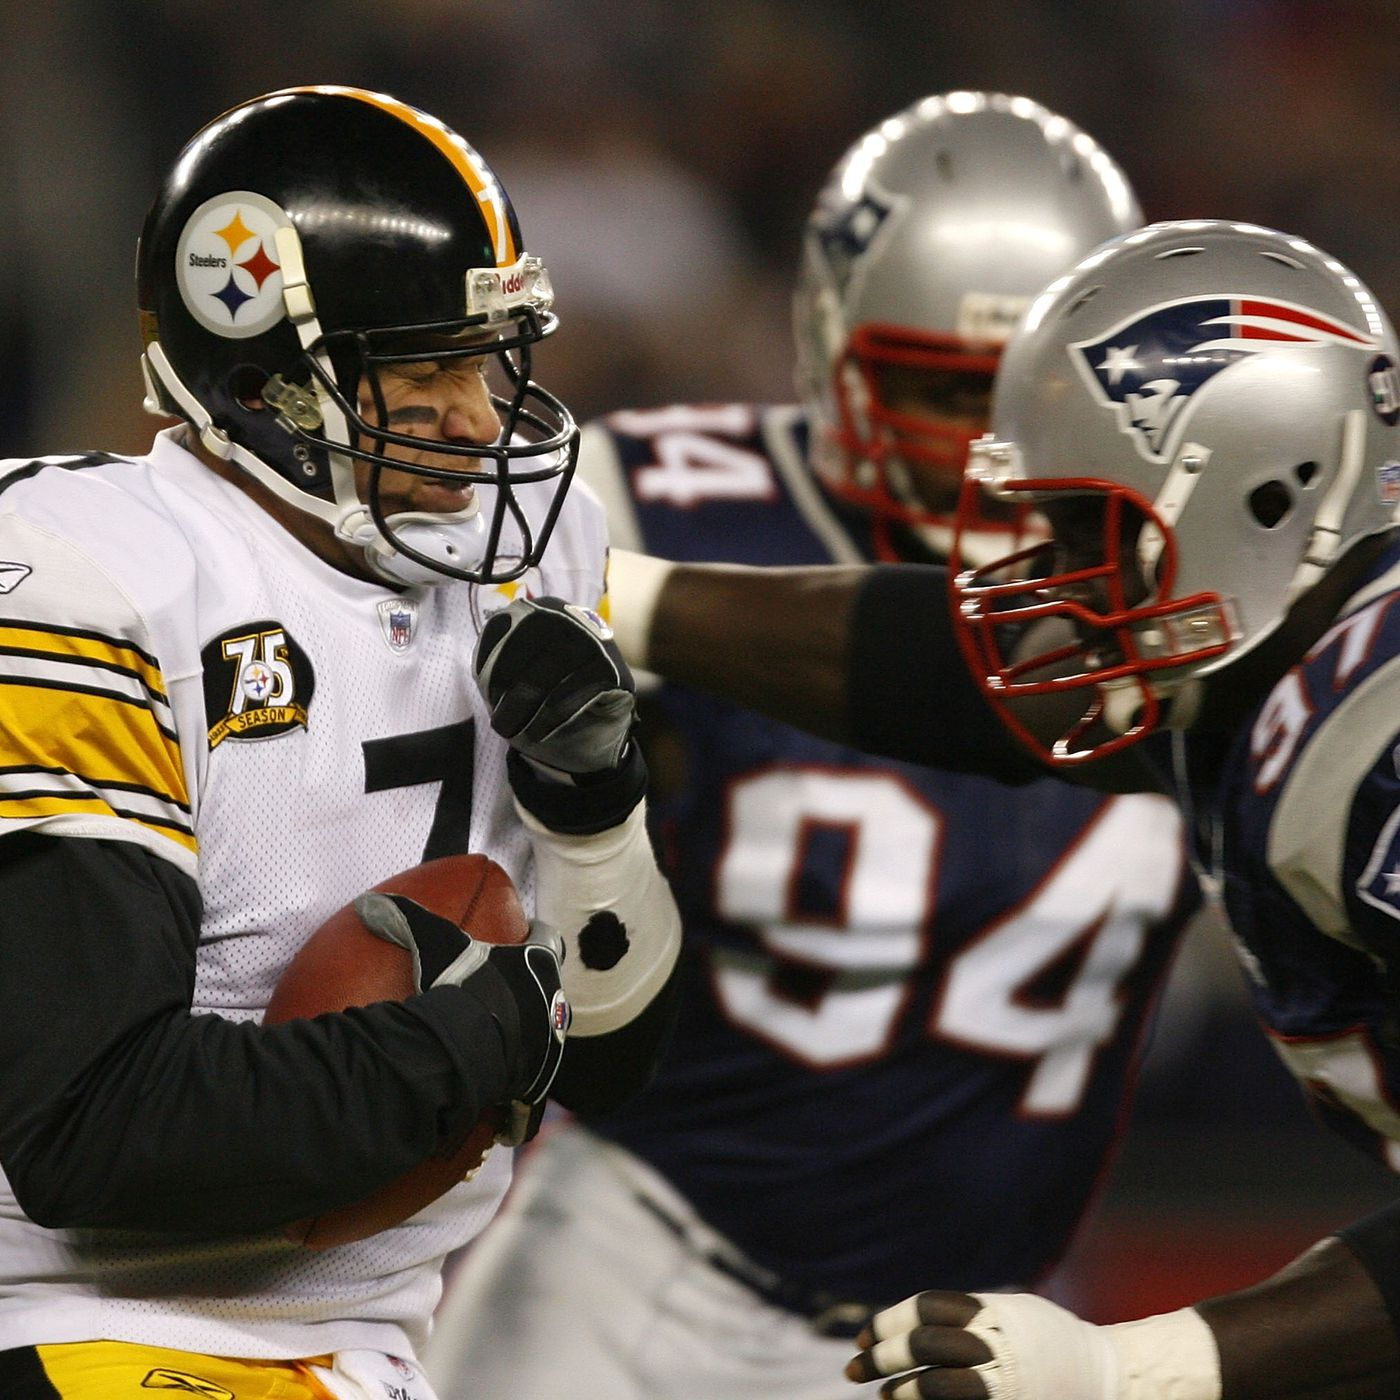 super popular 13dd3 c2490 Steelers QB Ben Roethlisberger has striking home and away ...